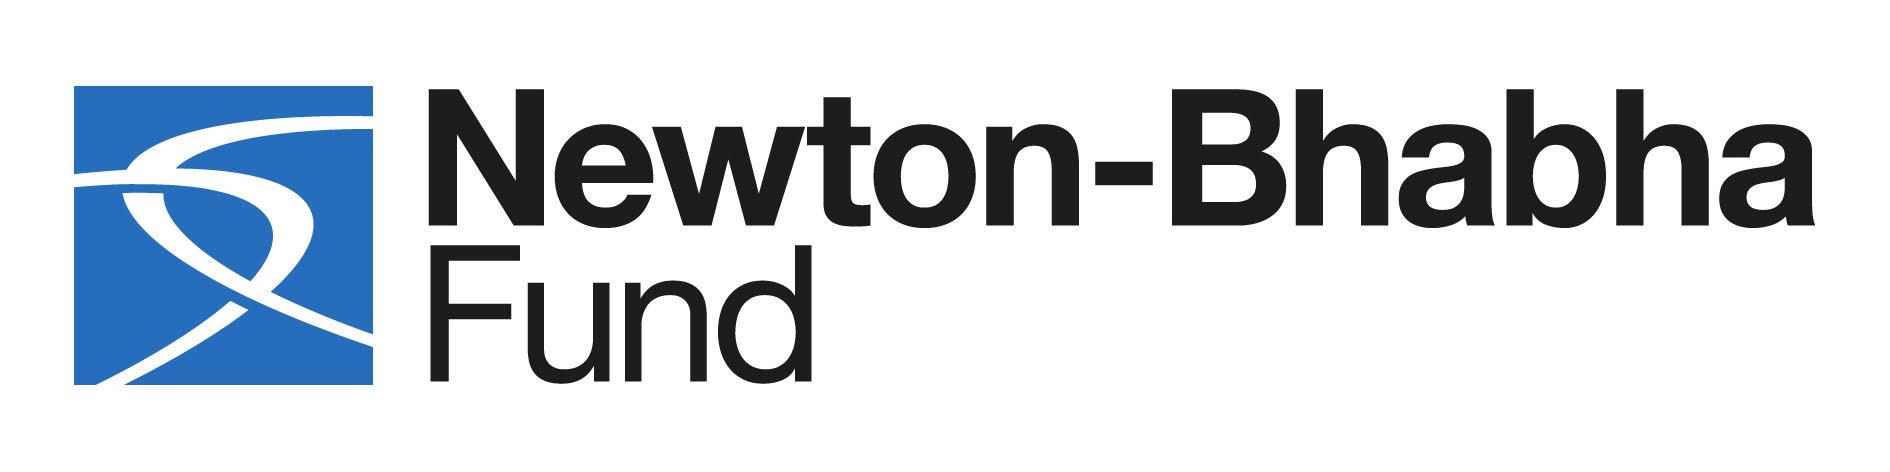 Newton Bhabha Fund